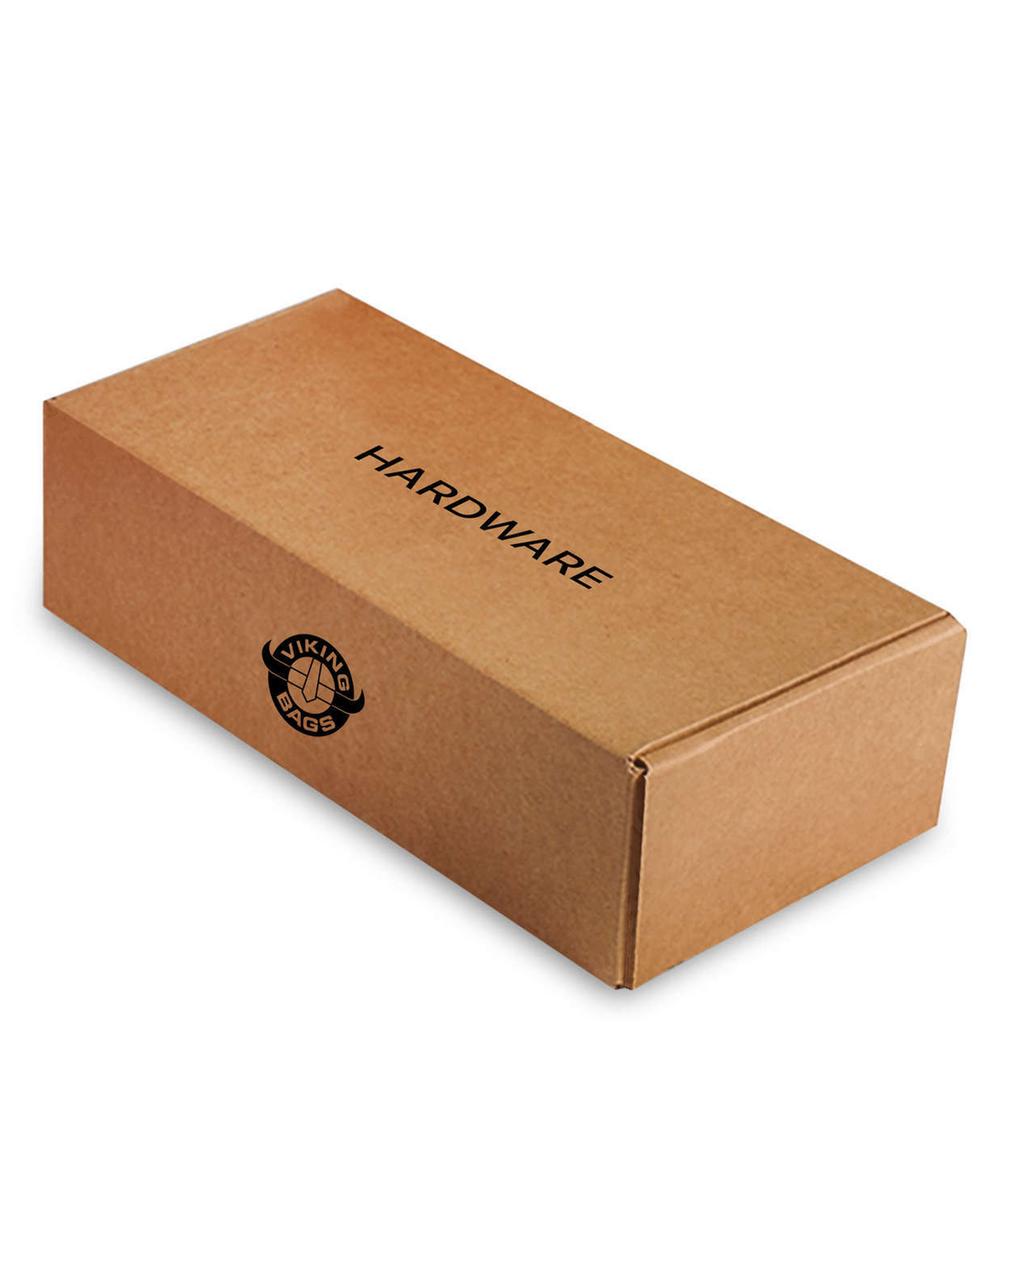 Honda CMX250C Rebel 250 Viking Lamellar Leather Covered Shock Cutout Hard Saddlebag Hardware Box